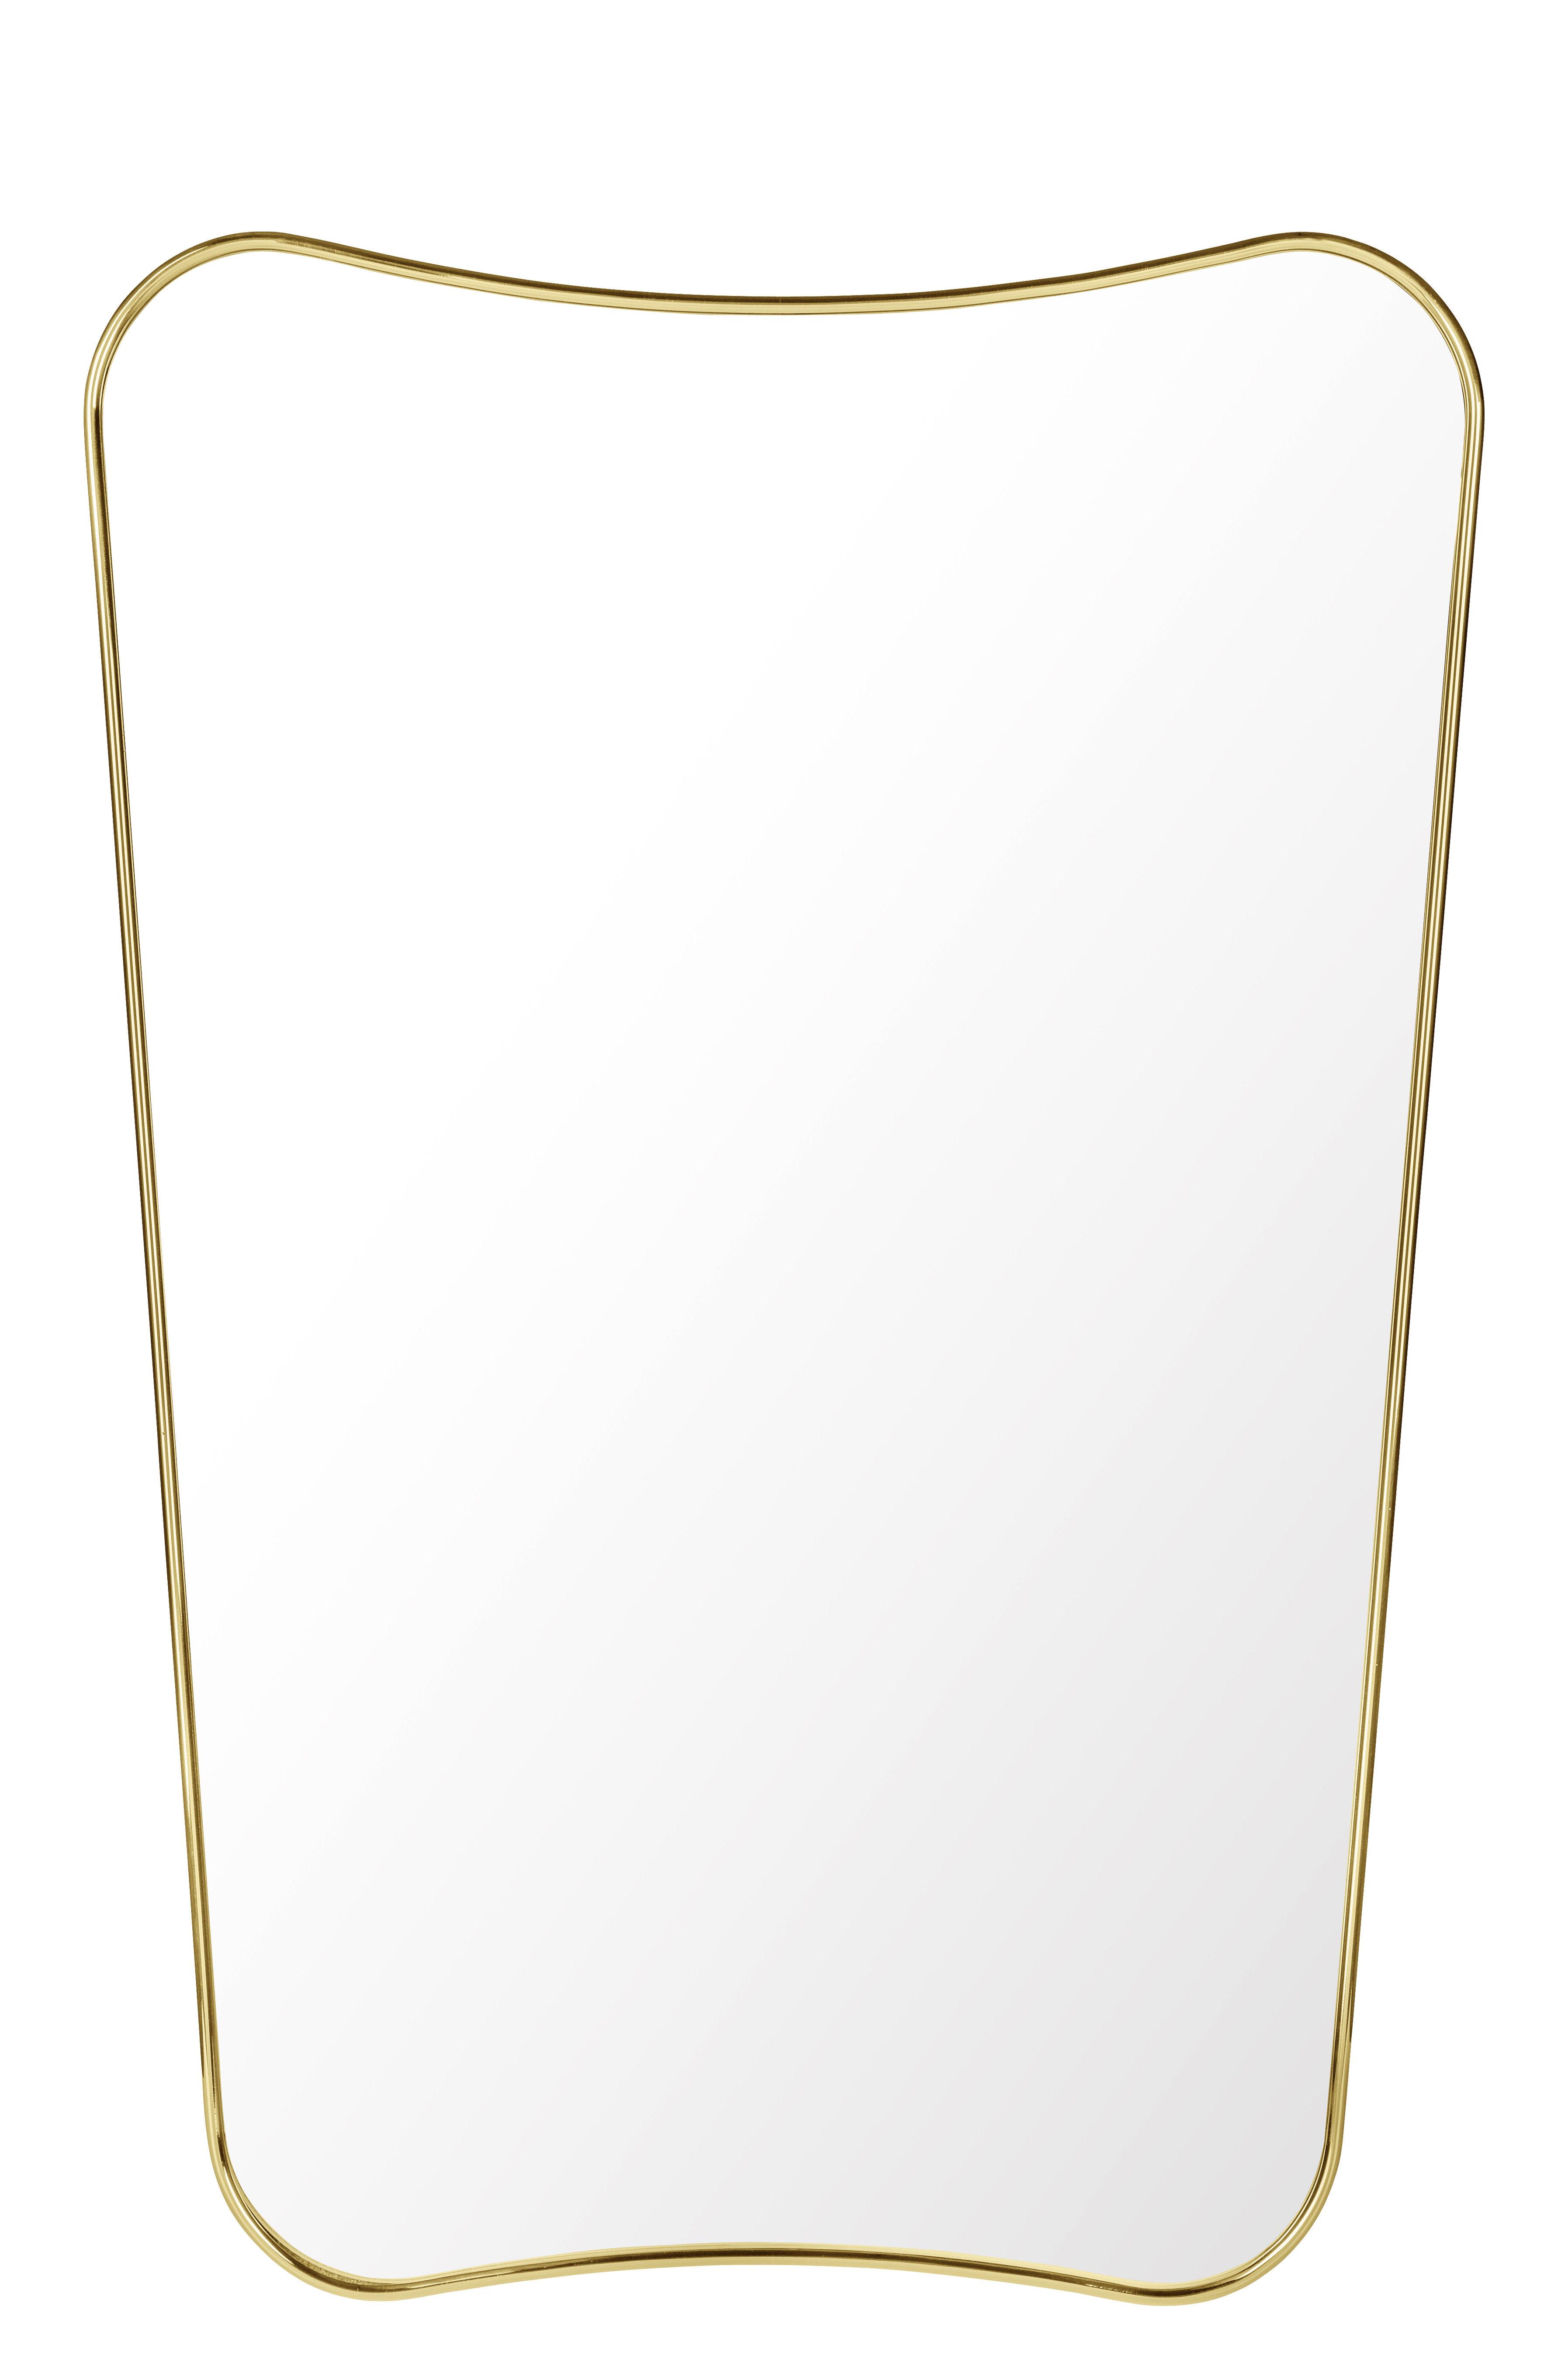 Dekoration - Spiegel - F.A.33 Wandspiegel / Gio Ponti - L 54 x H 80 cm - Gubi - Messing - Messing